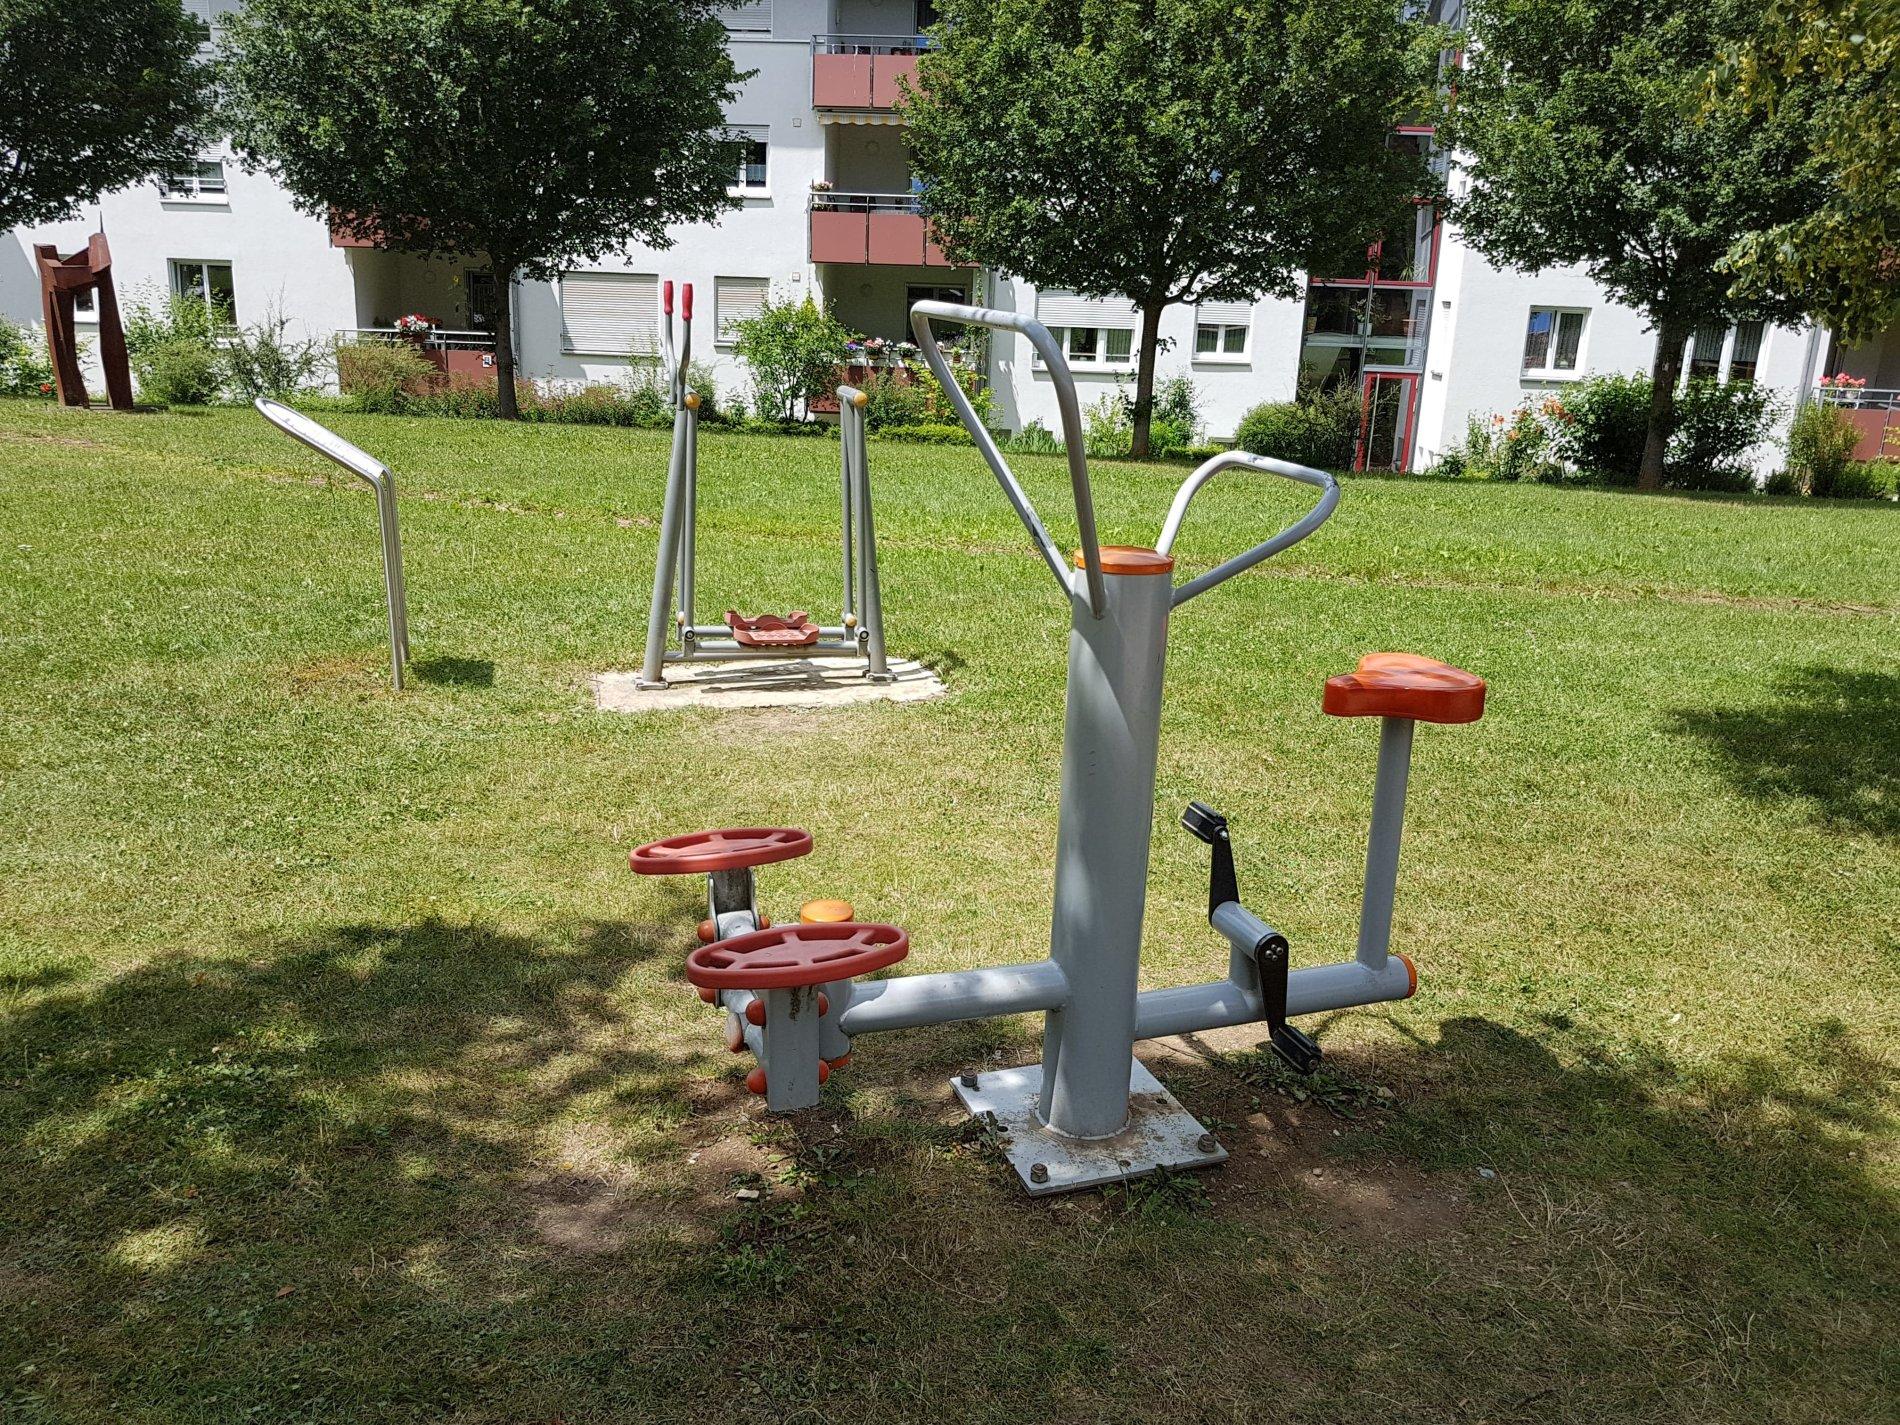 Spiel Spaß Stadtgarten Kernstadt